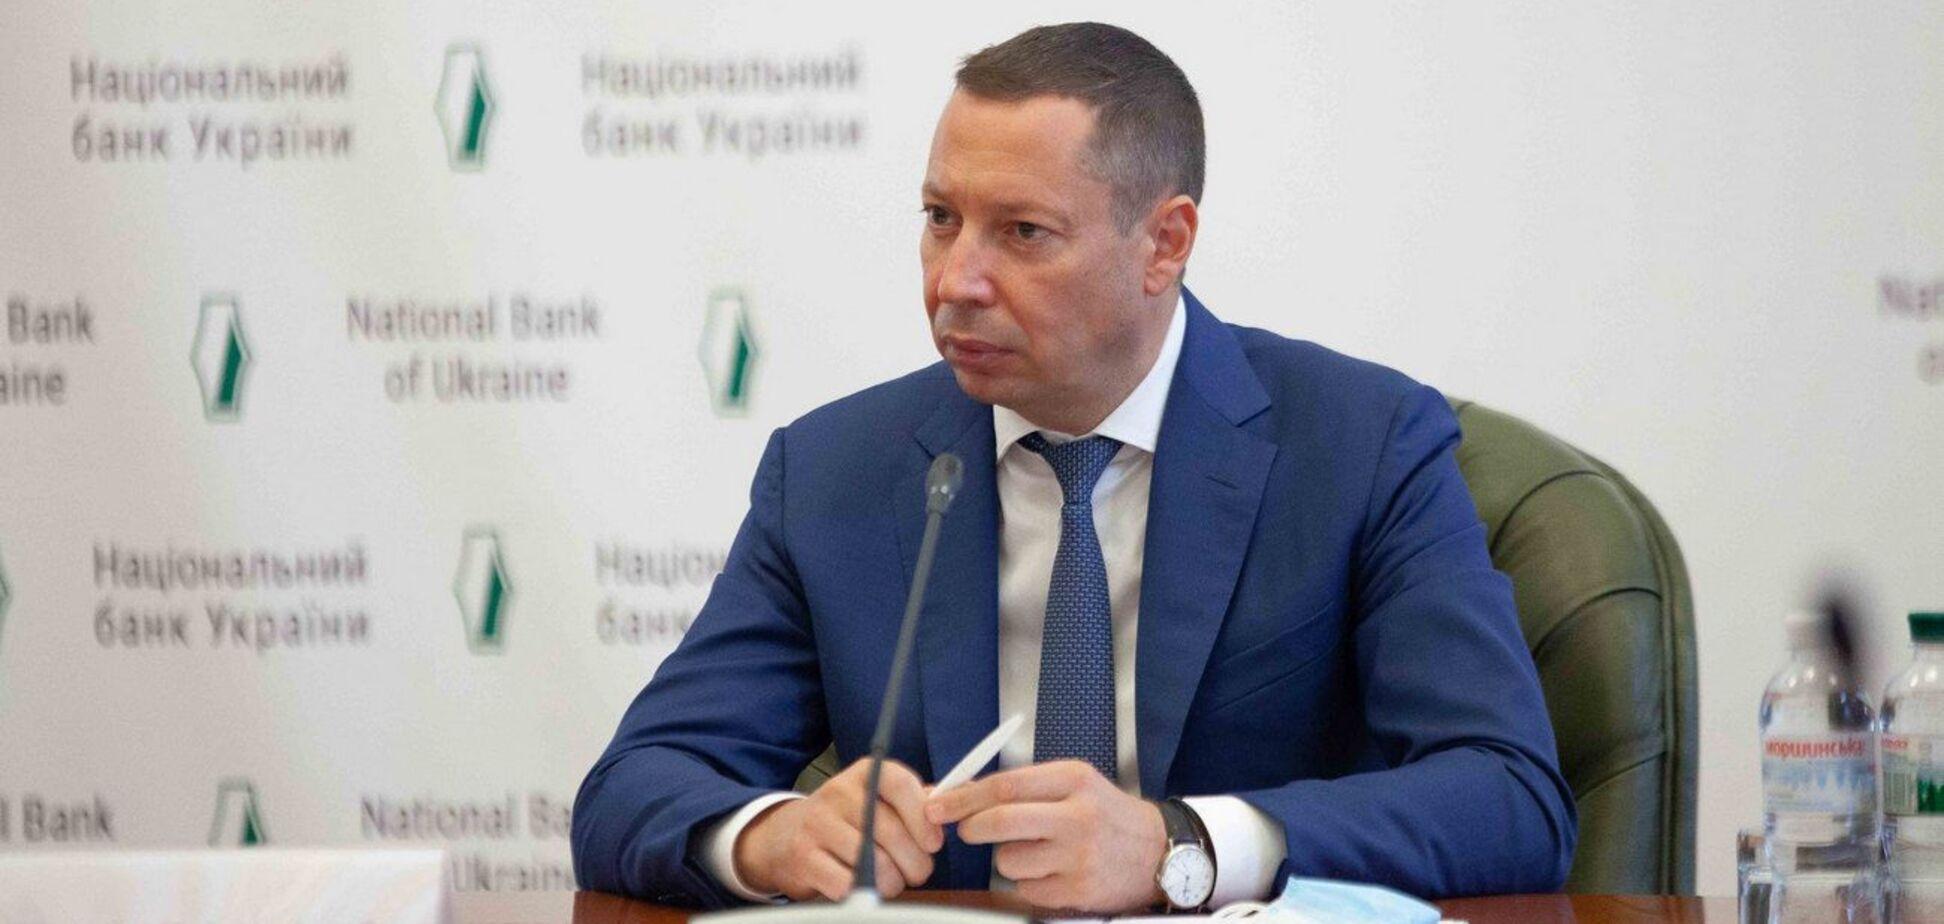 Голова НБУ Шевченко виступив протизакону щодо еквайрингу